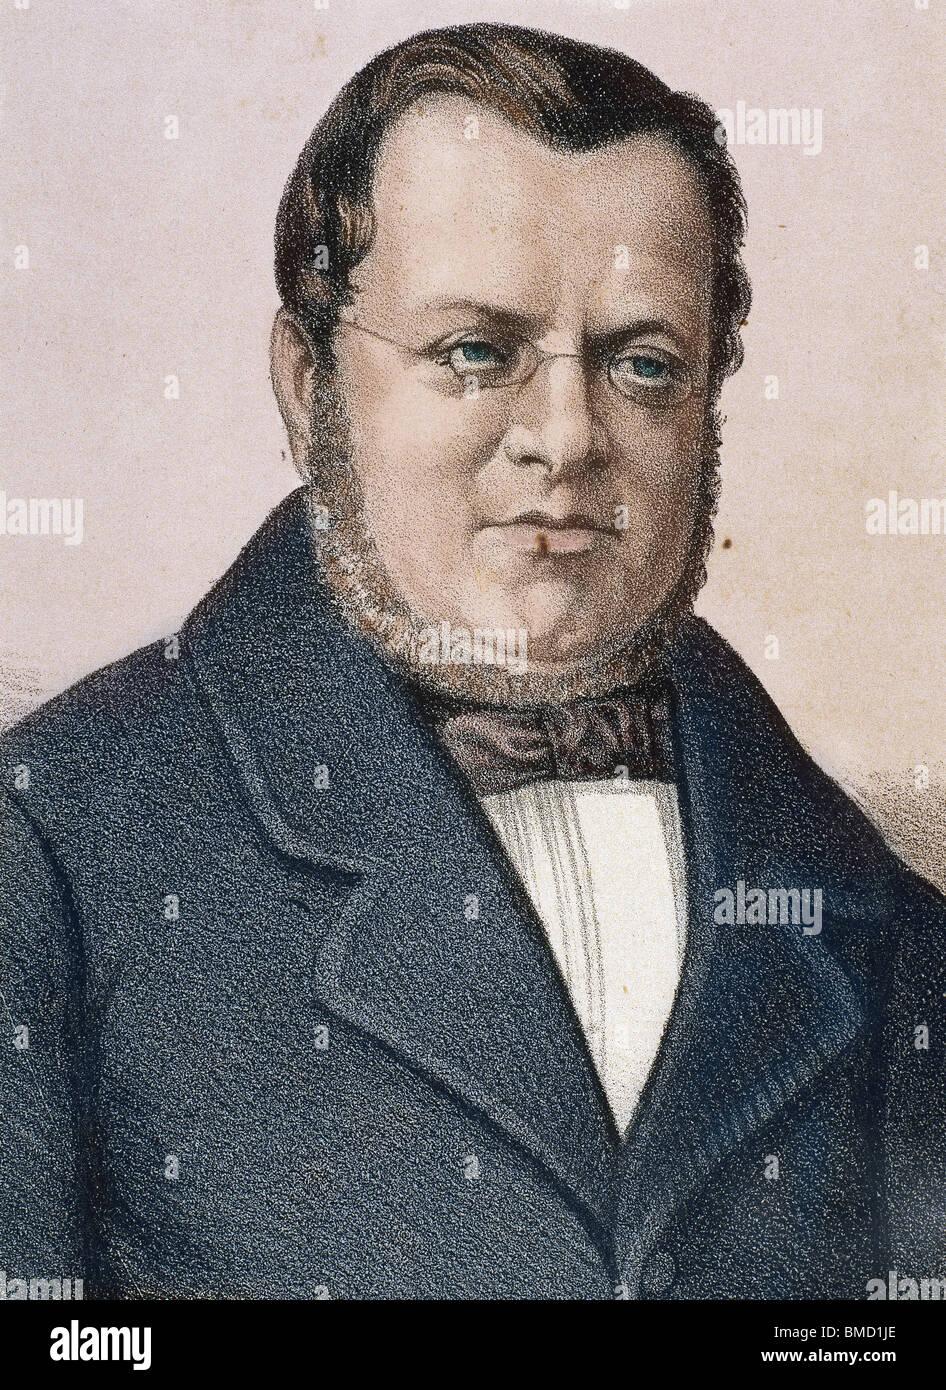 Cavour, Camillo Benso, Count of (Turin ,1810-1861) Italian statesman. - Stock Image